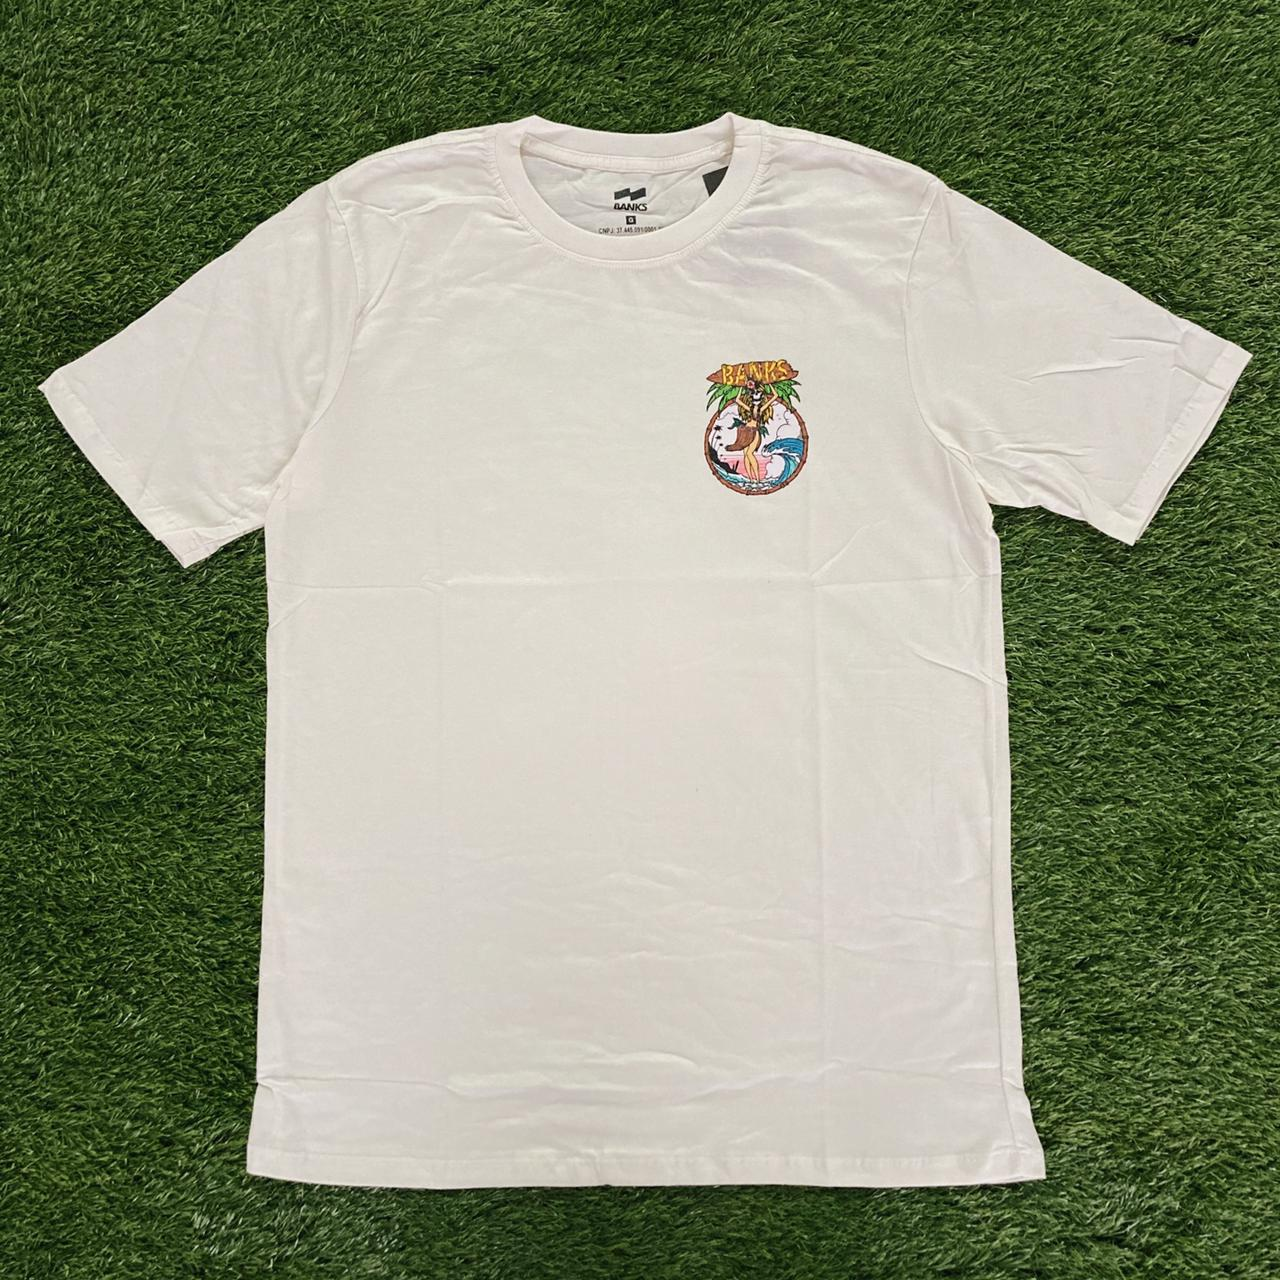 Camiseta banks cav havaiana creme